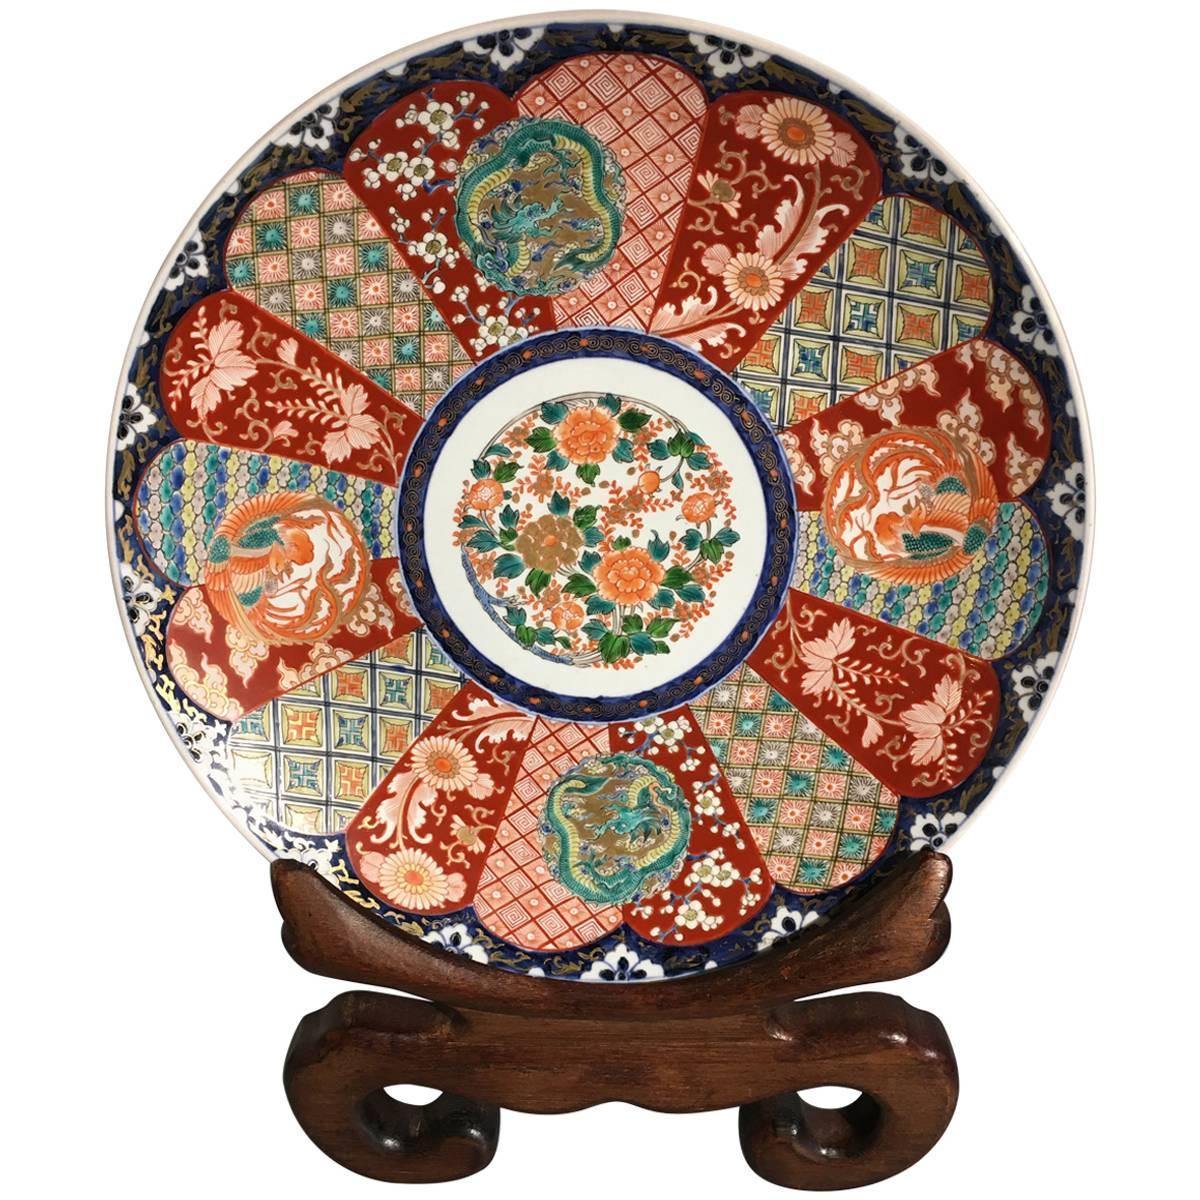 Japanese Meiji Period Imari Porcelain Charger, Late 19th Century